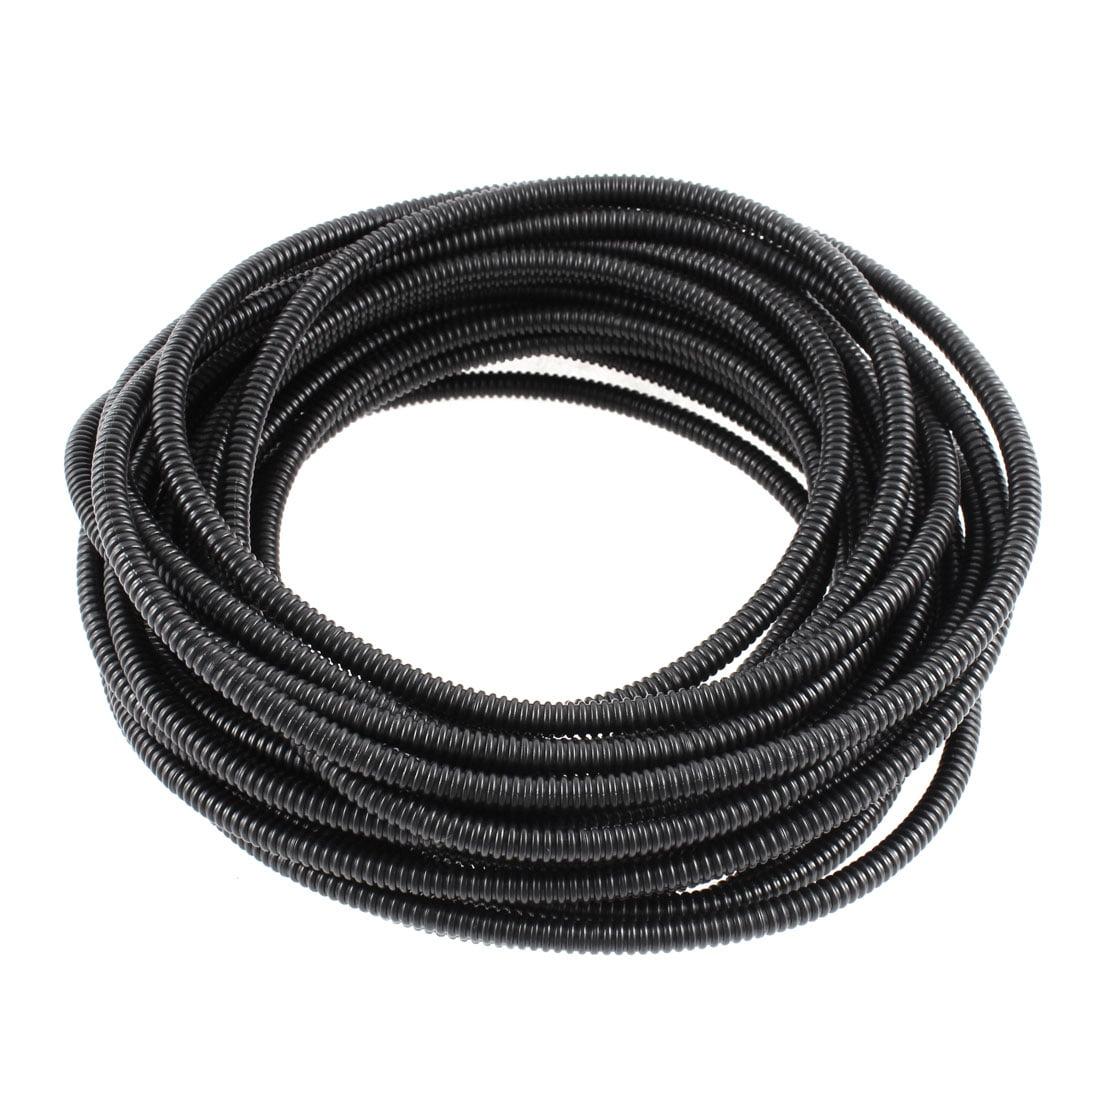 Flexible PVC 7mm Outer Dia Corrugated Tubing Conduit Tube Pipe 11M 36ft Long